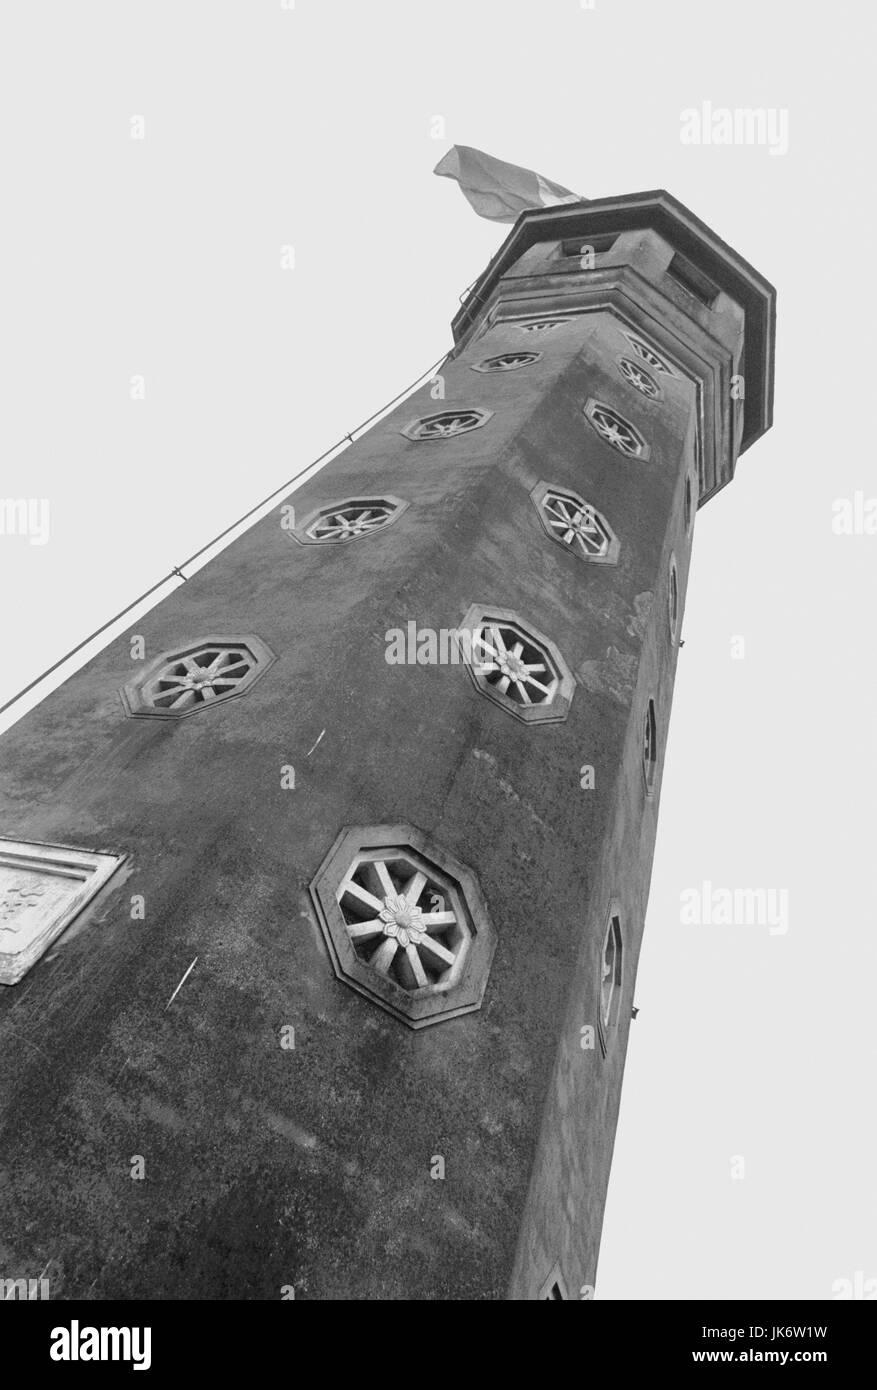 Vietnam, Hanoi, Turm, Fahne,  von unten, s/w  außen, Südostasien, Hinterindien, Tongkingdelta, Hauptstadt, - Stock Image